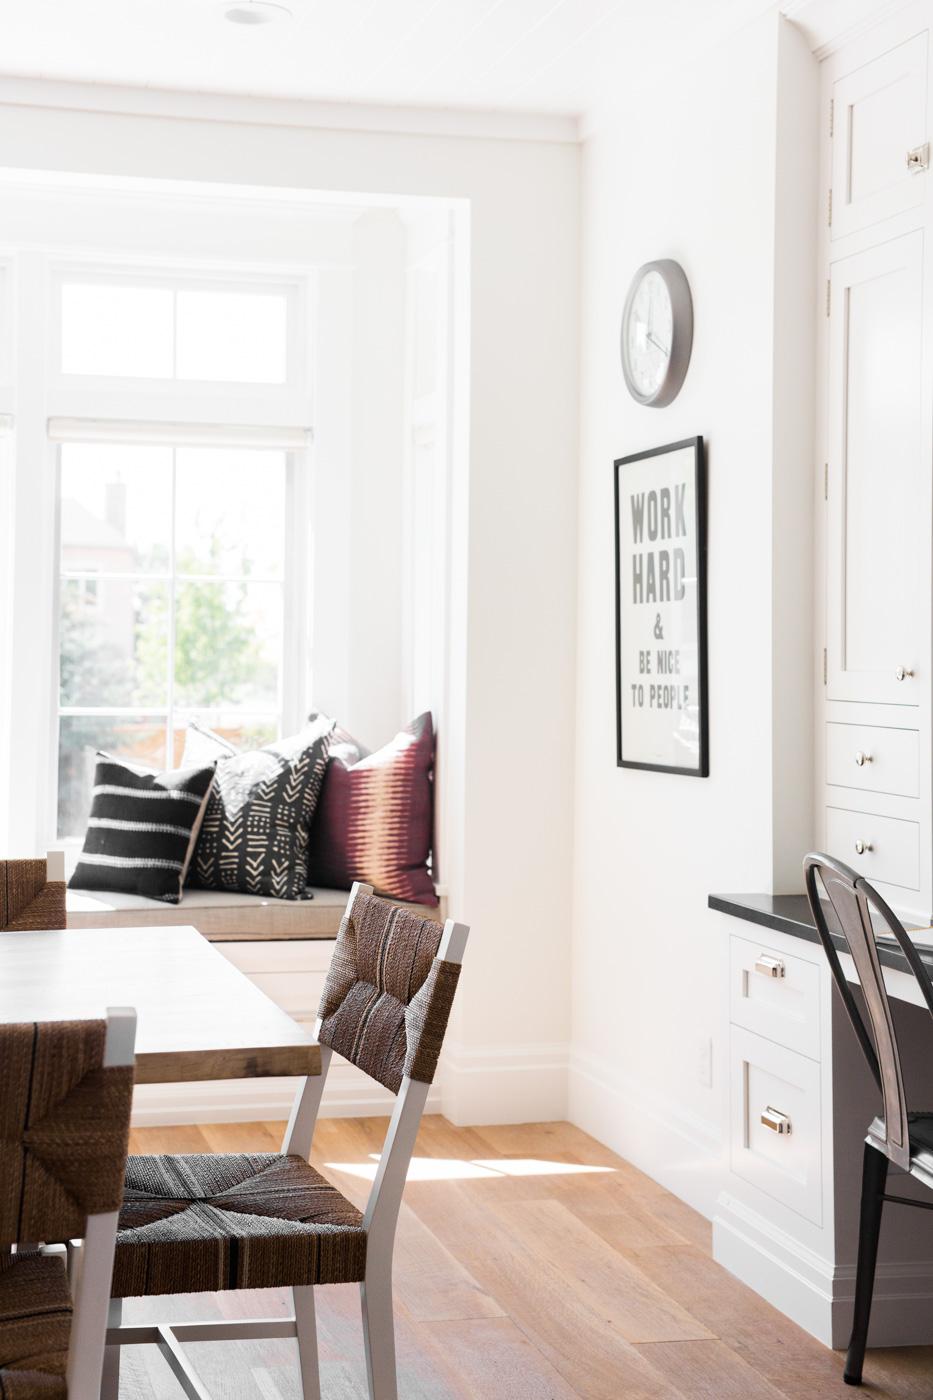 Kitchen+nook+with+window+seat+and+workstation+||+Studio+McGee.jpg